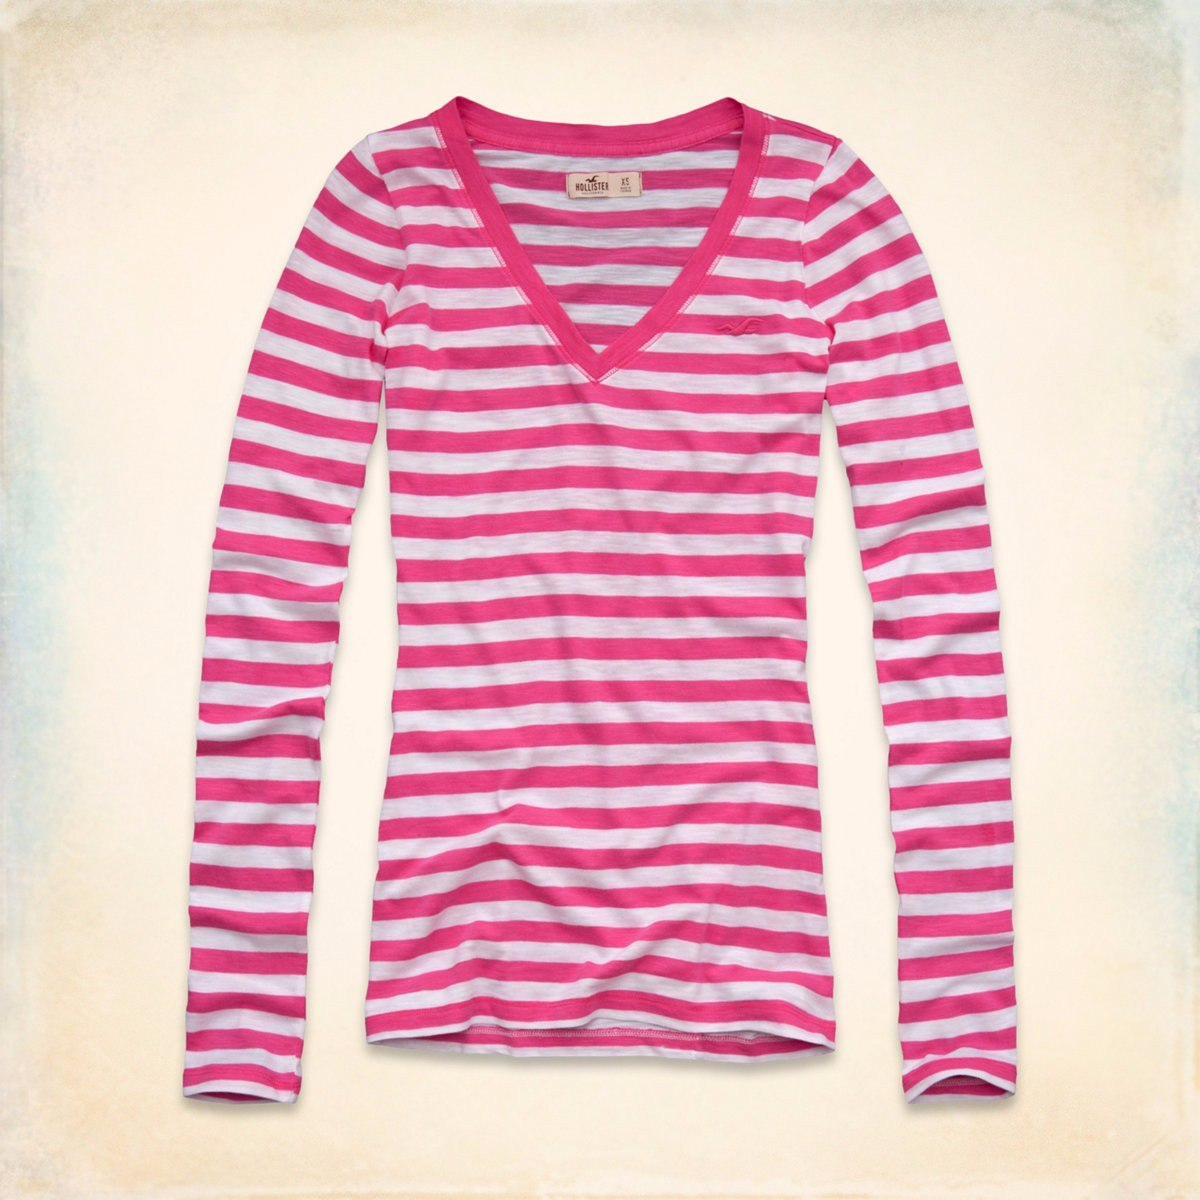 fac735d3b3 camiseta hollister feminina polos blusas abercrombie aero. Carregando zoom.